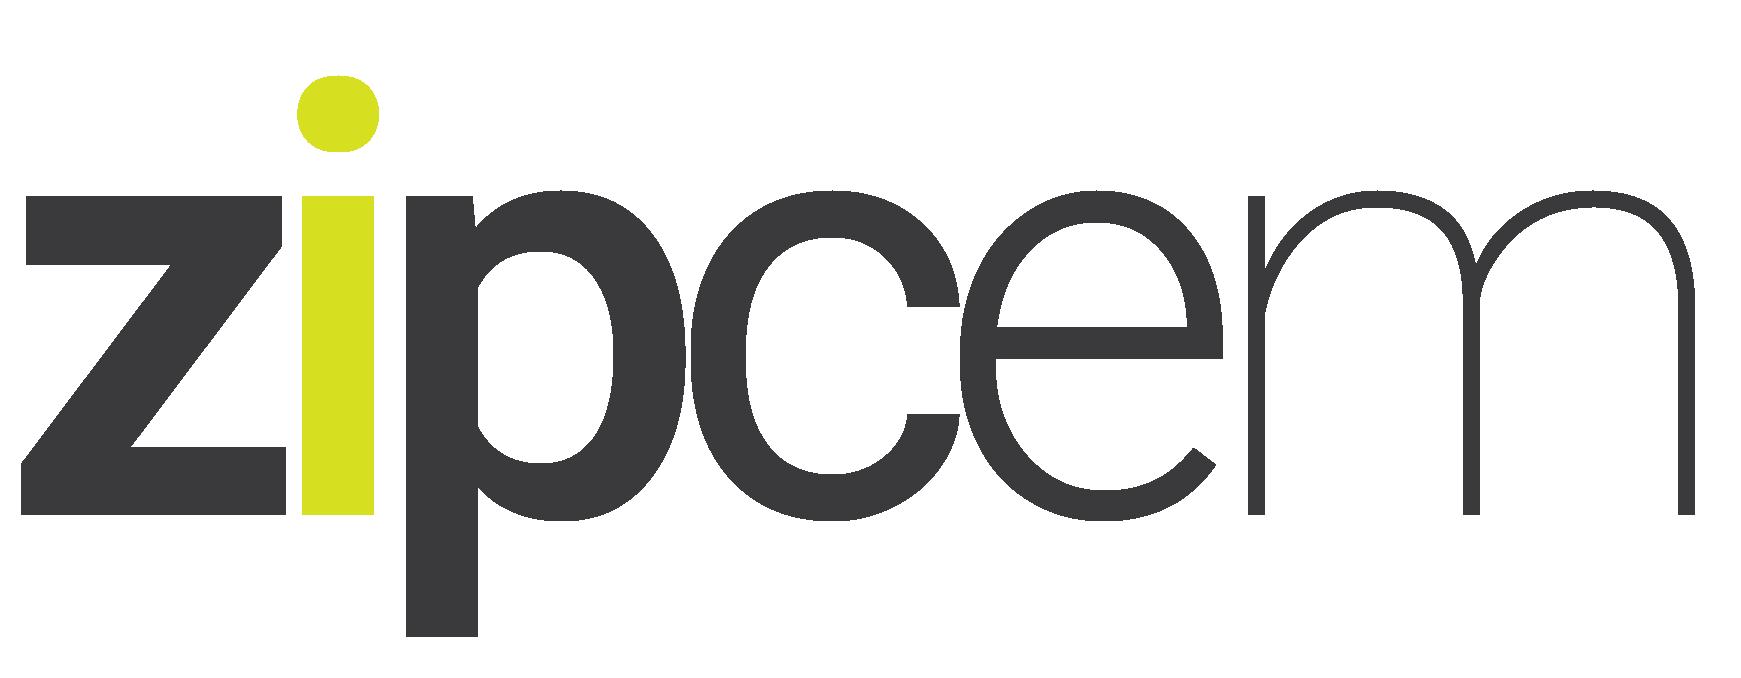 Logo ZIPCEMU.